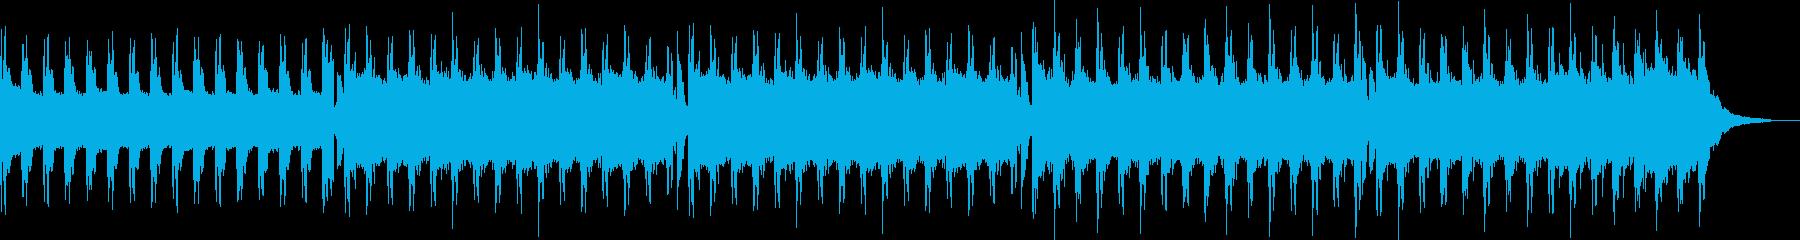 EDMドロップオンリー 09の再生済みの波形